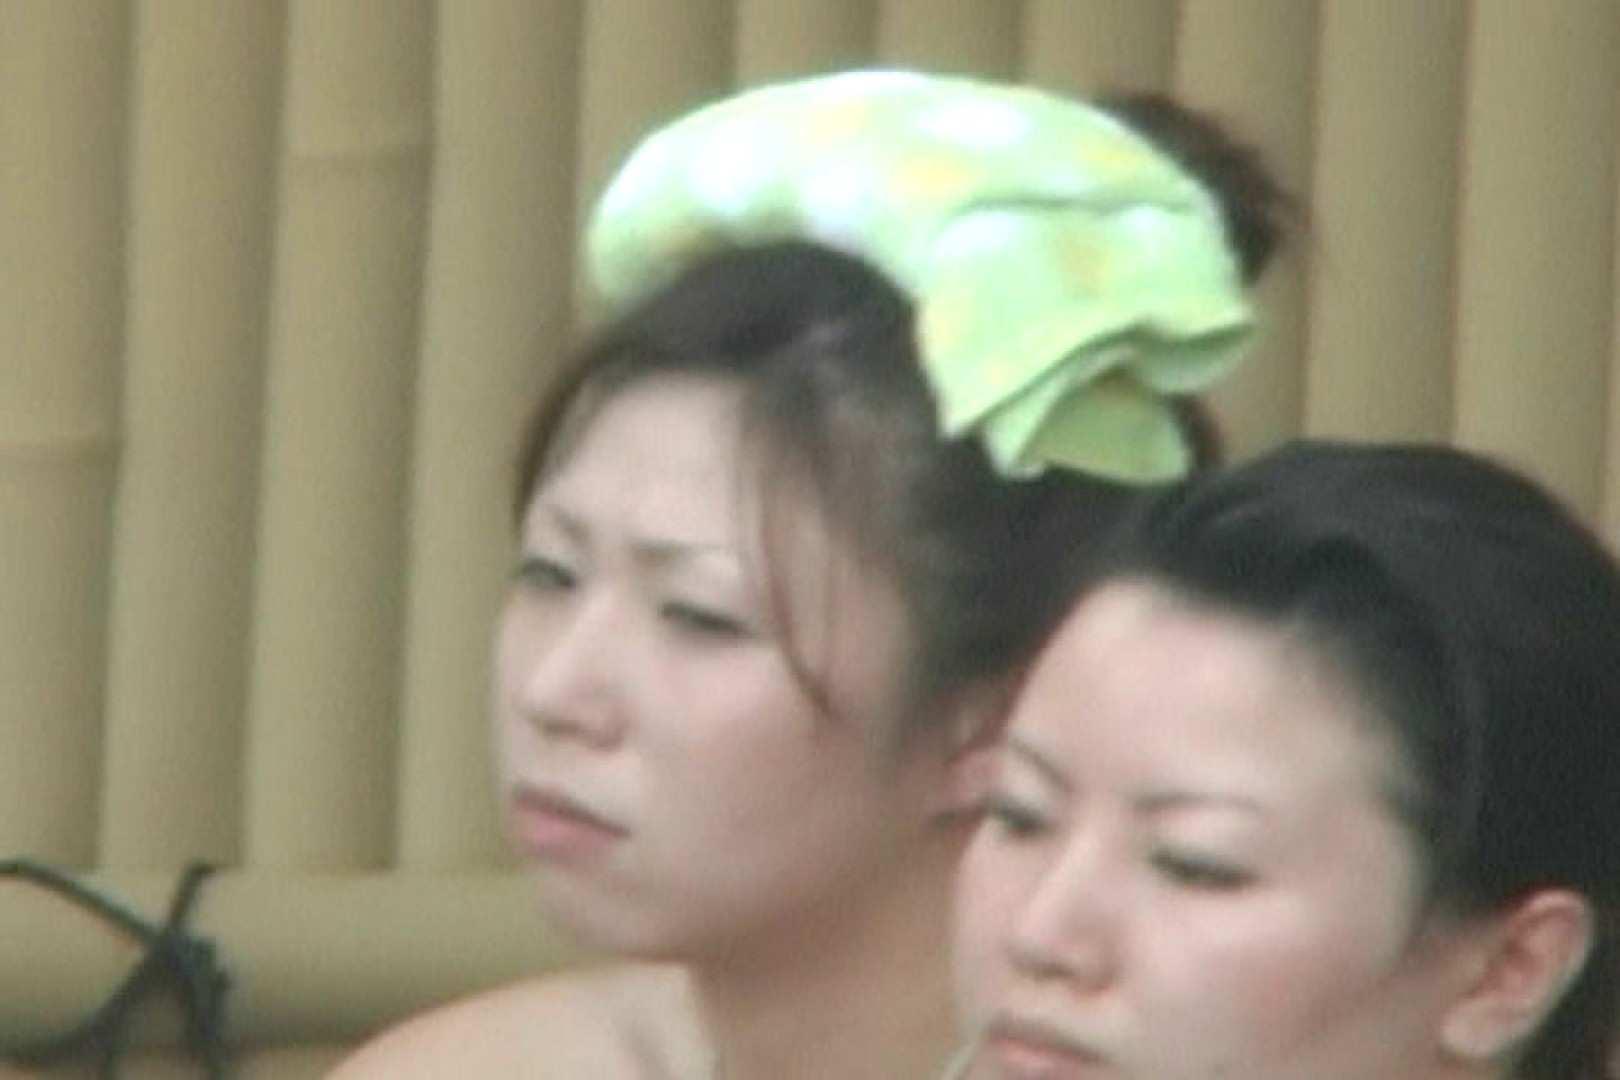 Aquaな露天風呂Vol.593 盗撮師作品 アダルト動画キャプチャ 83pic 62